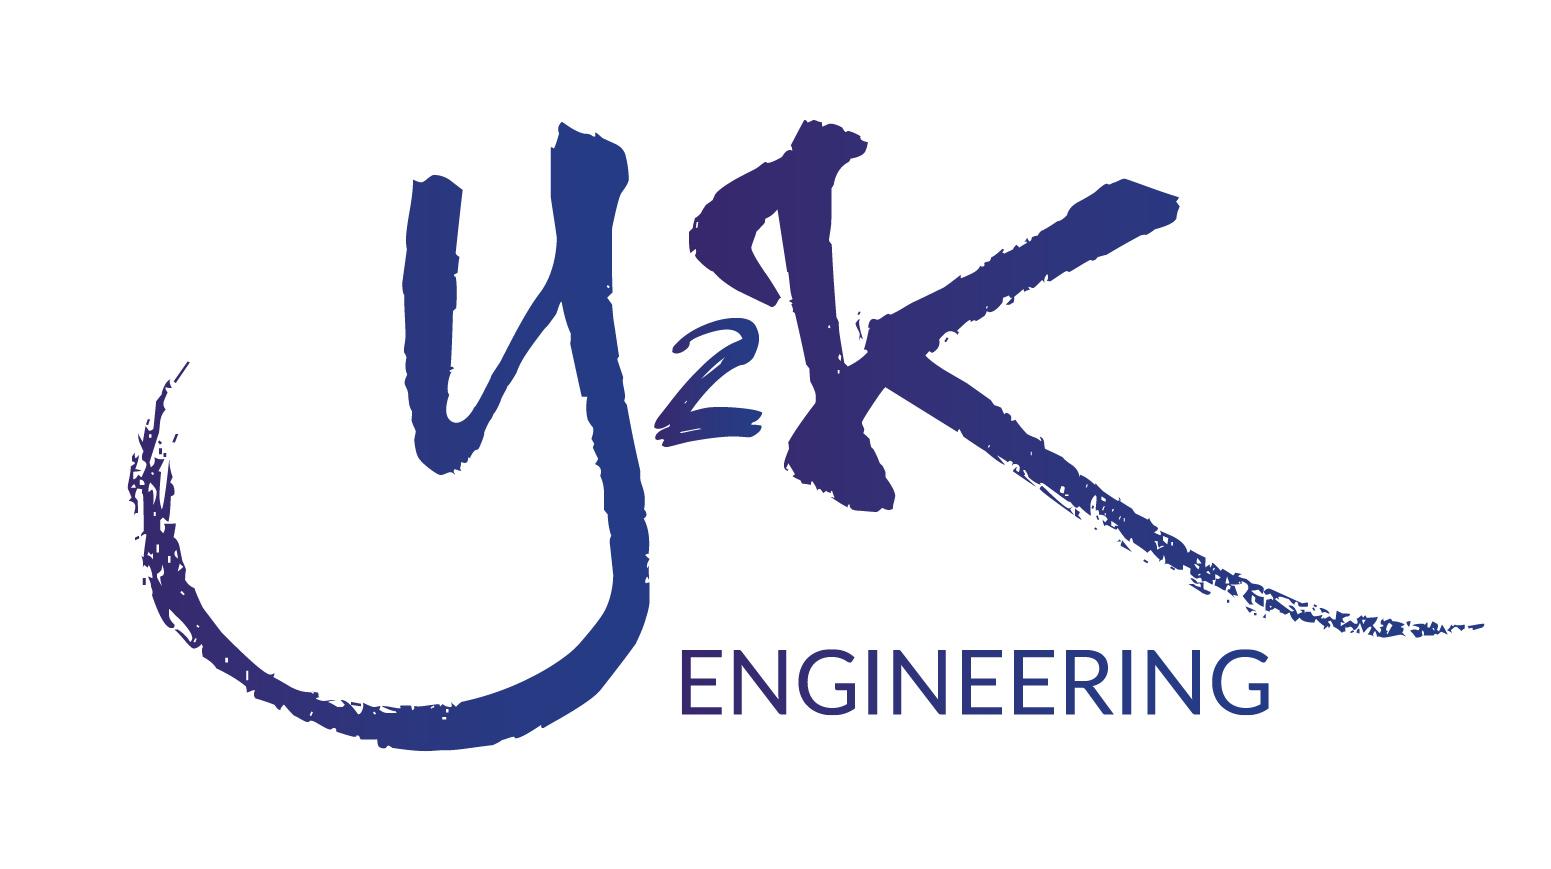 engineering logo [ 1500 x 840 Pixel ]